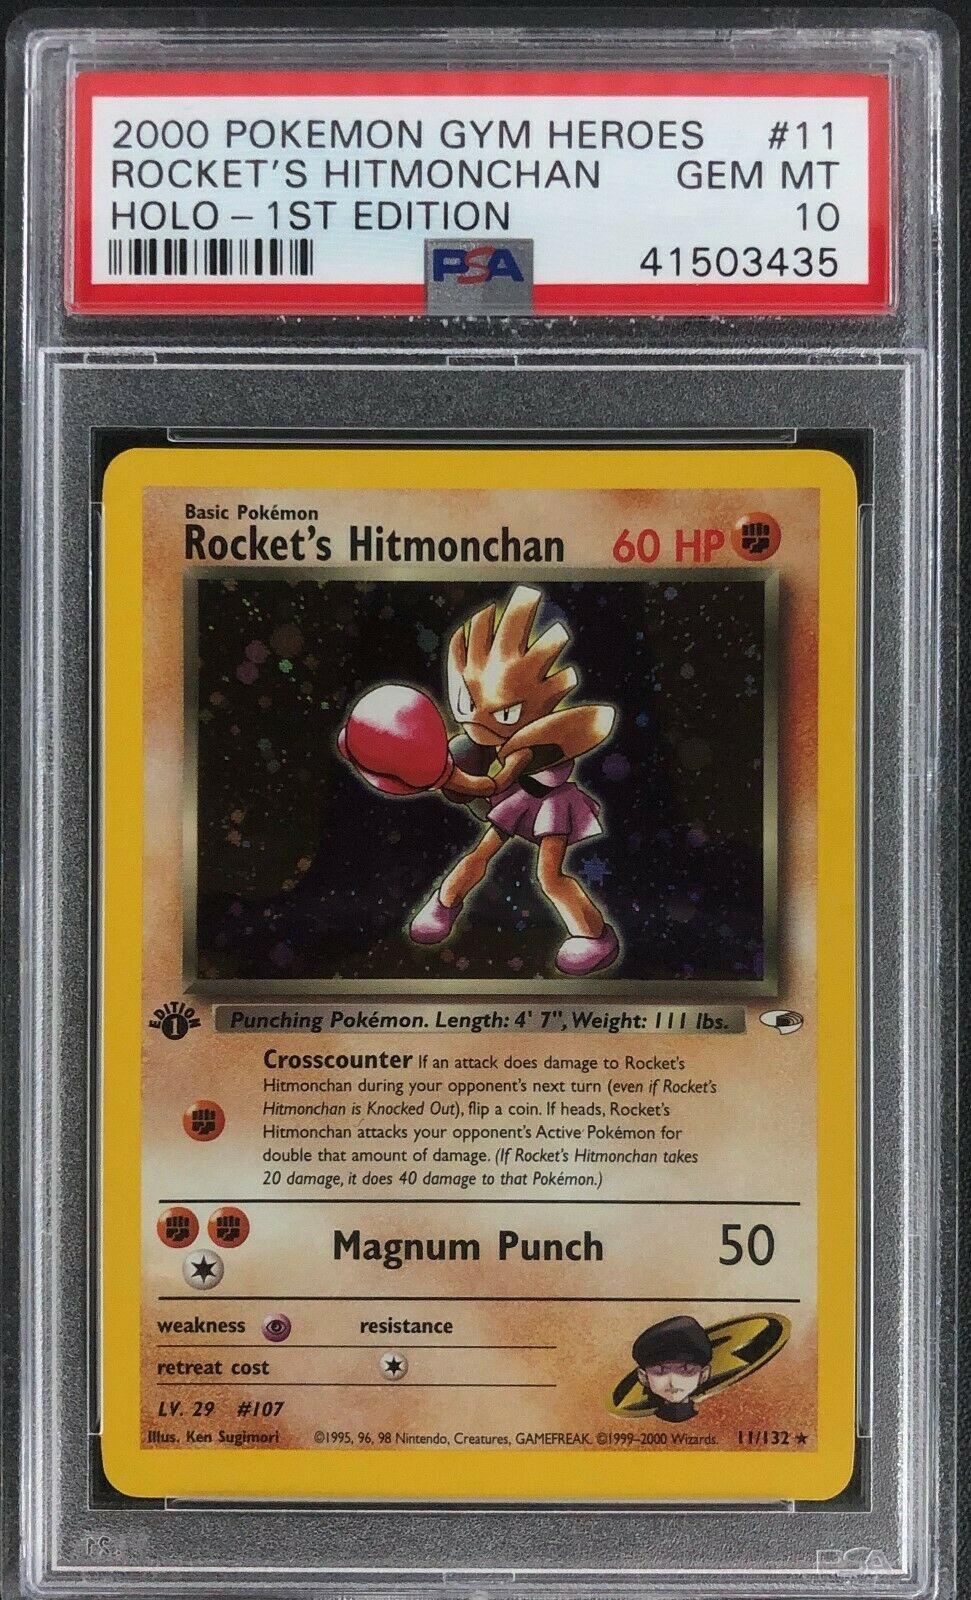 1st Edition Gym Heroes Rockets Hitmonchan Holo Pokemon Card Mint PSA 10